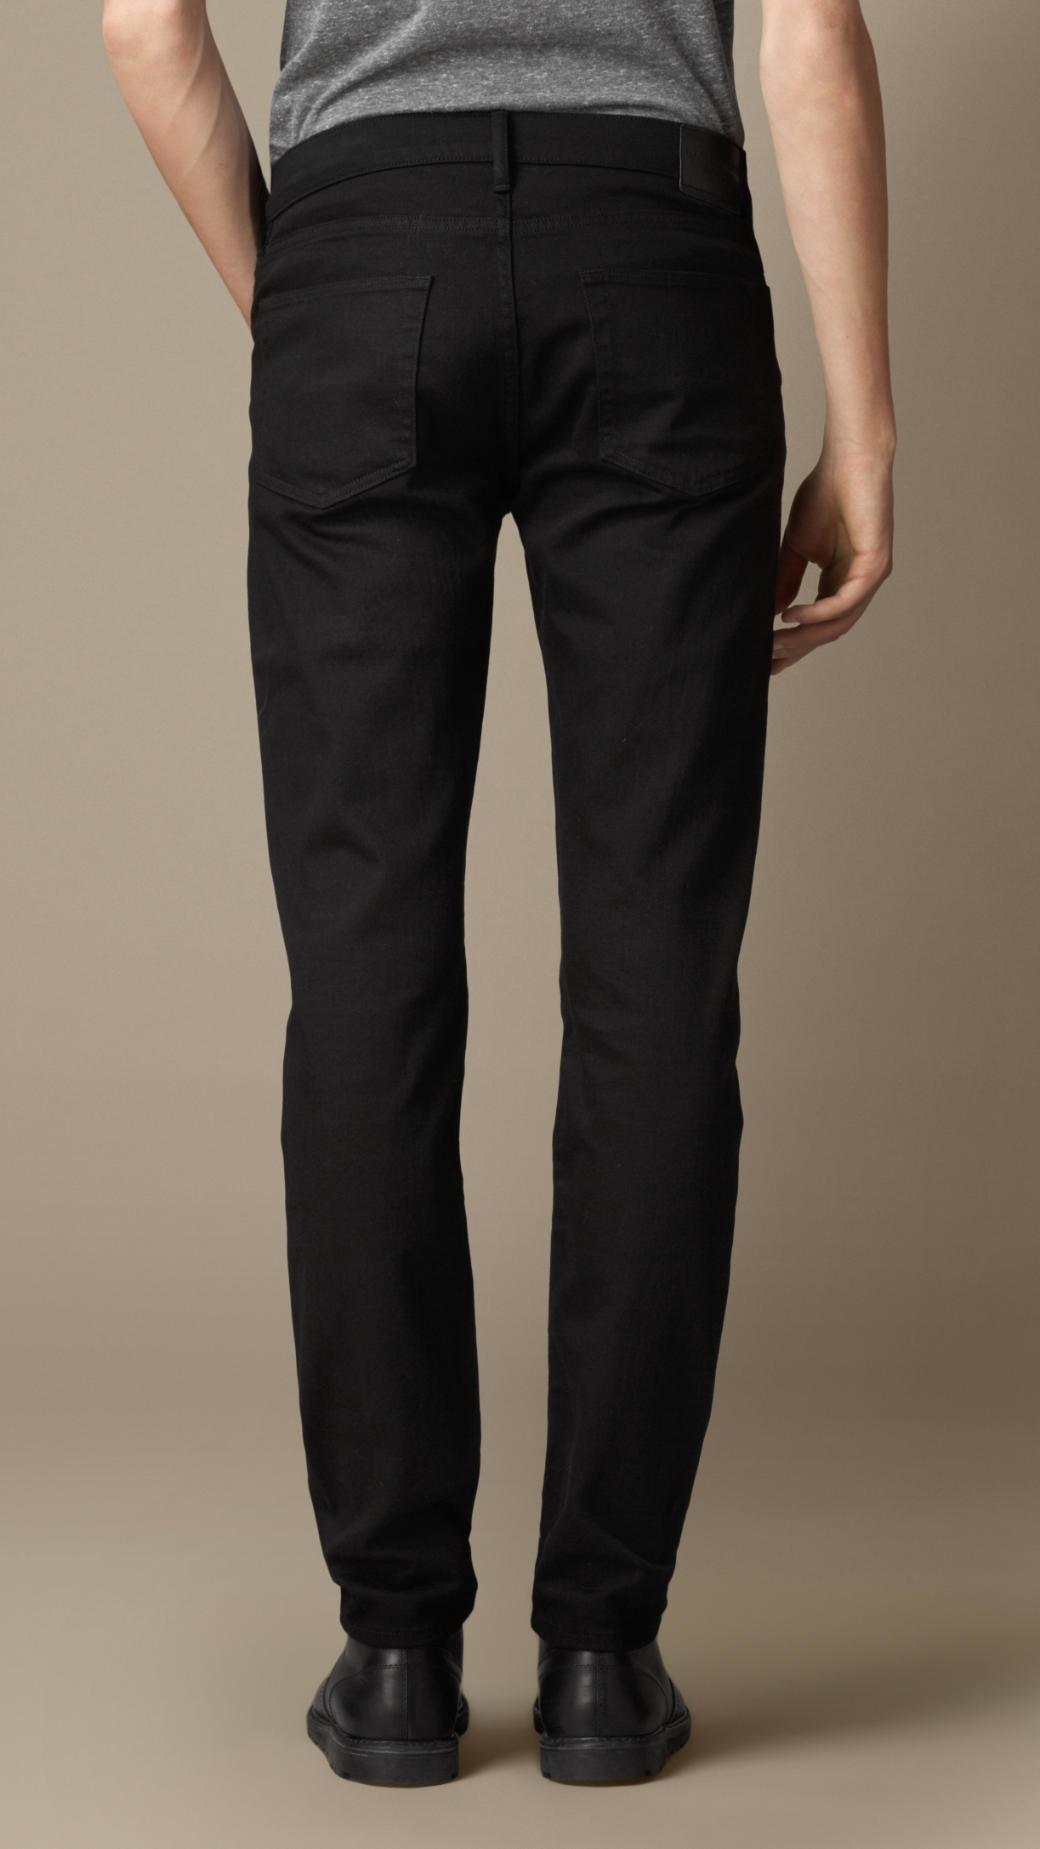 0aae9f7f5de24 Lyst - Burberry Slim Fit Deep Black Jeans in Black for Men